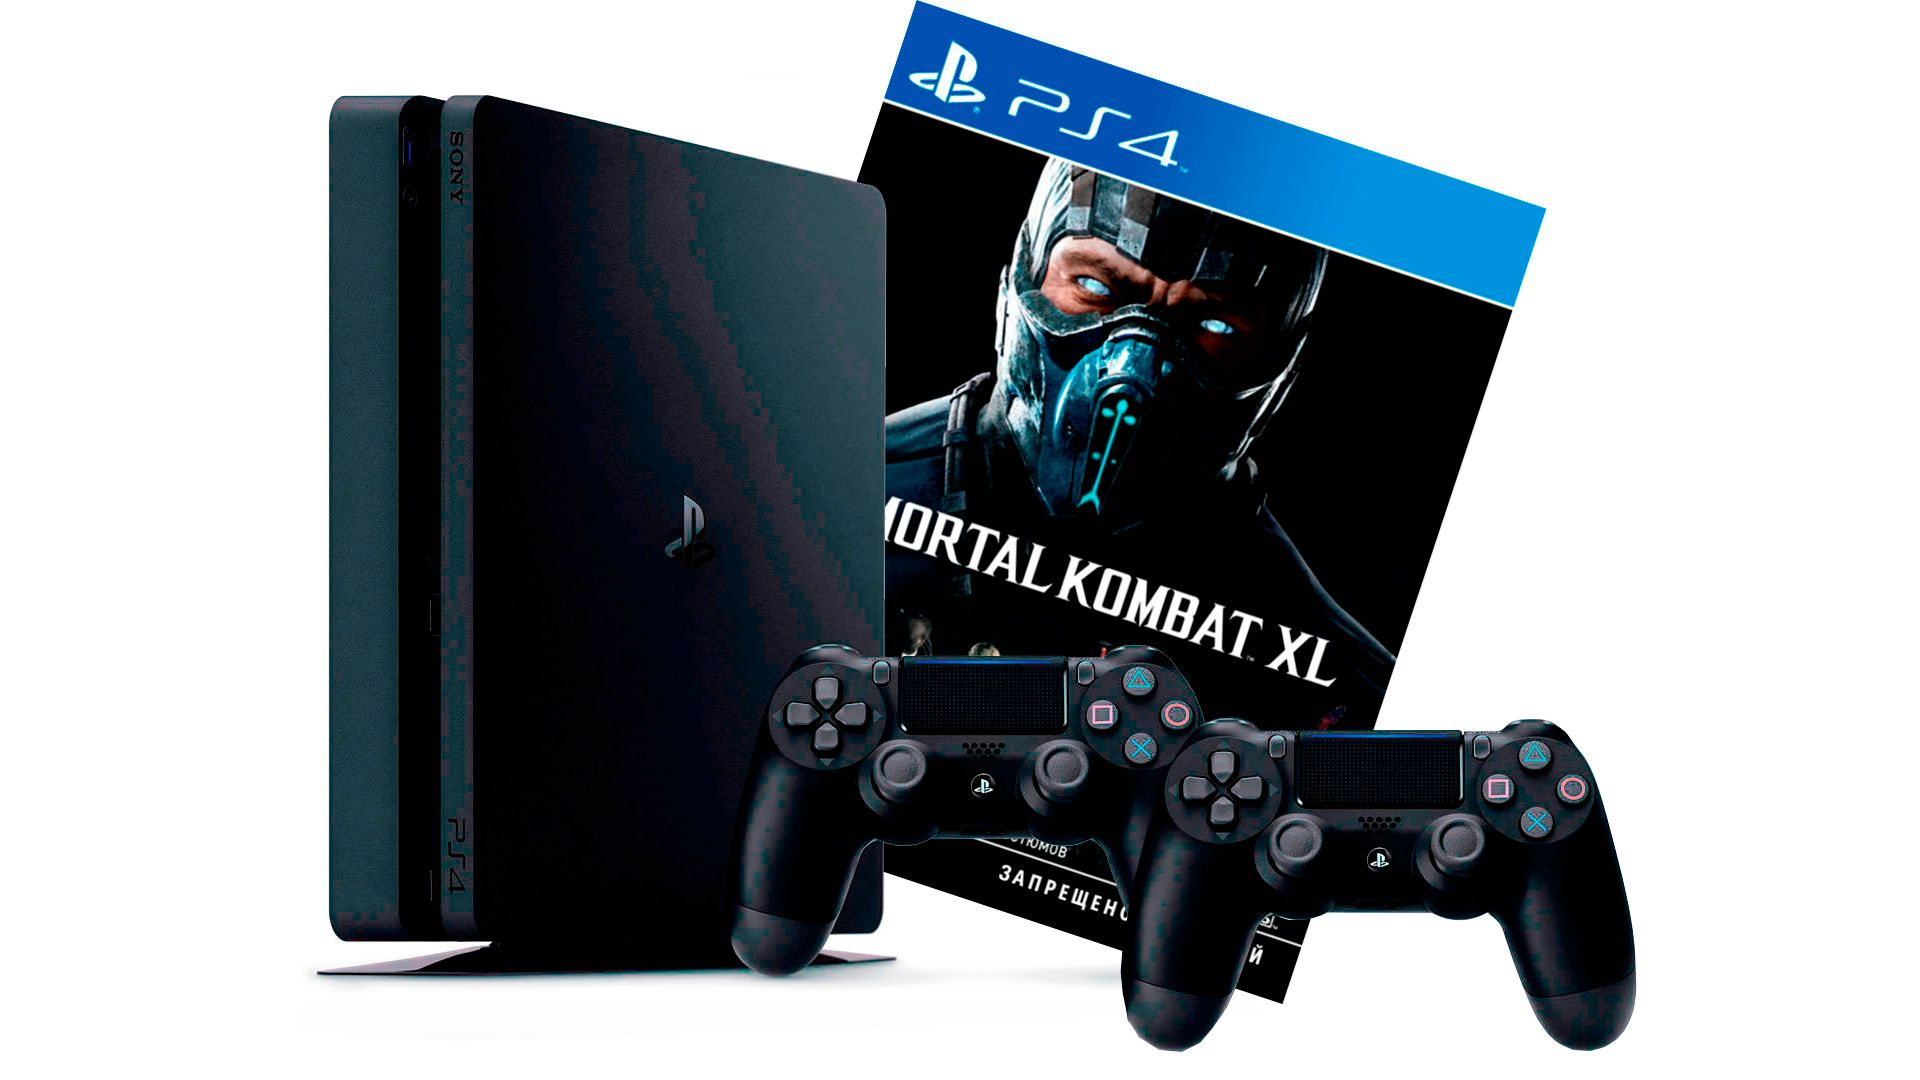 PlayStation 4 Slim 500Gb 2 джойстика, приставка и игра Mortal Kombat XL [PS4S5J2MXL]